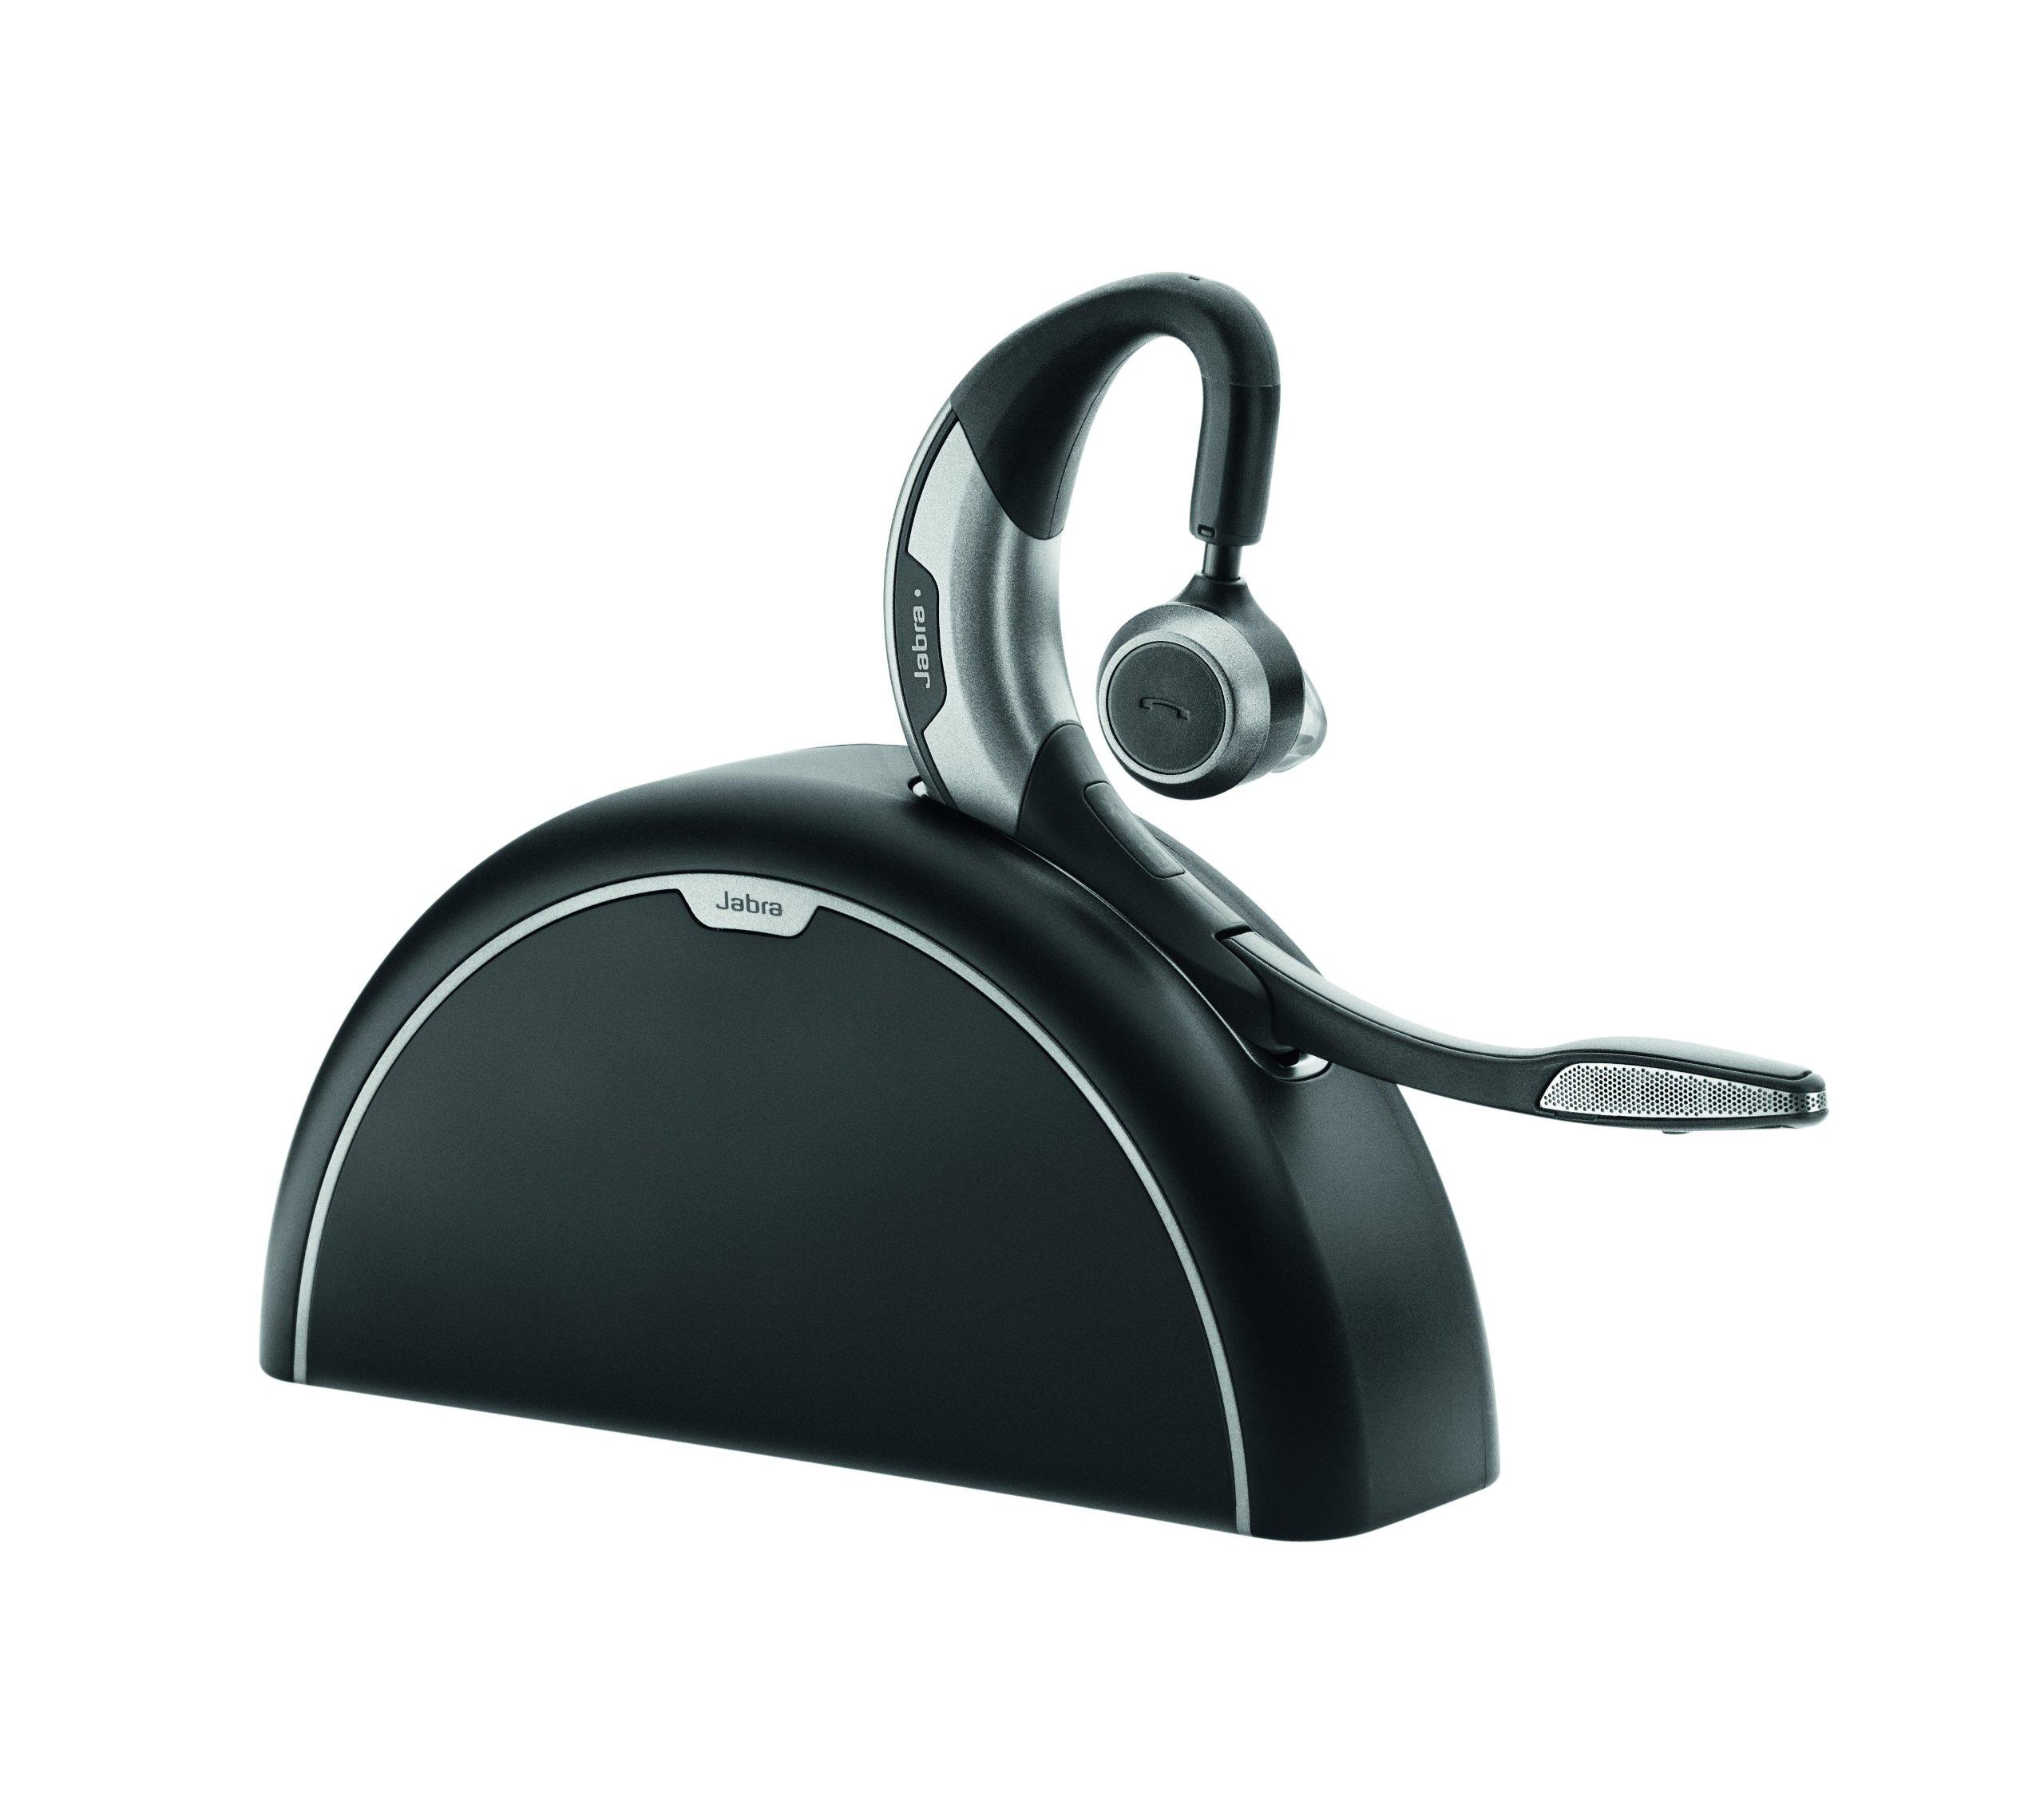 Jabra Motion UC Monaural Behind-the-Ear Bluetooth Headset